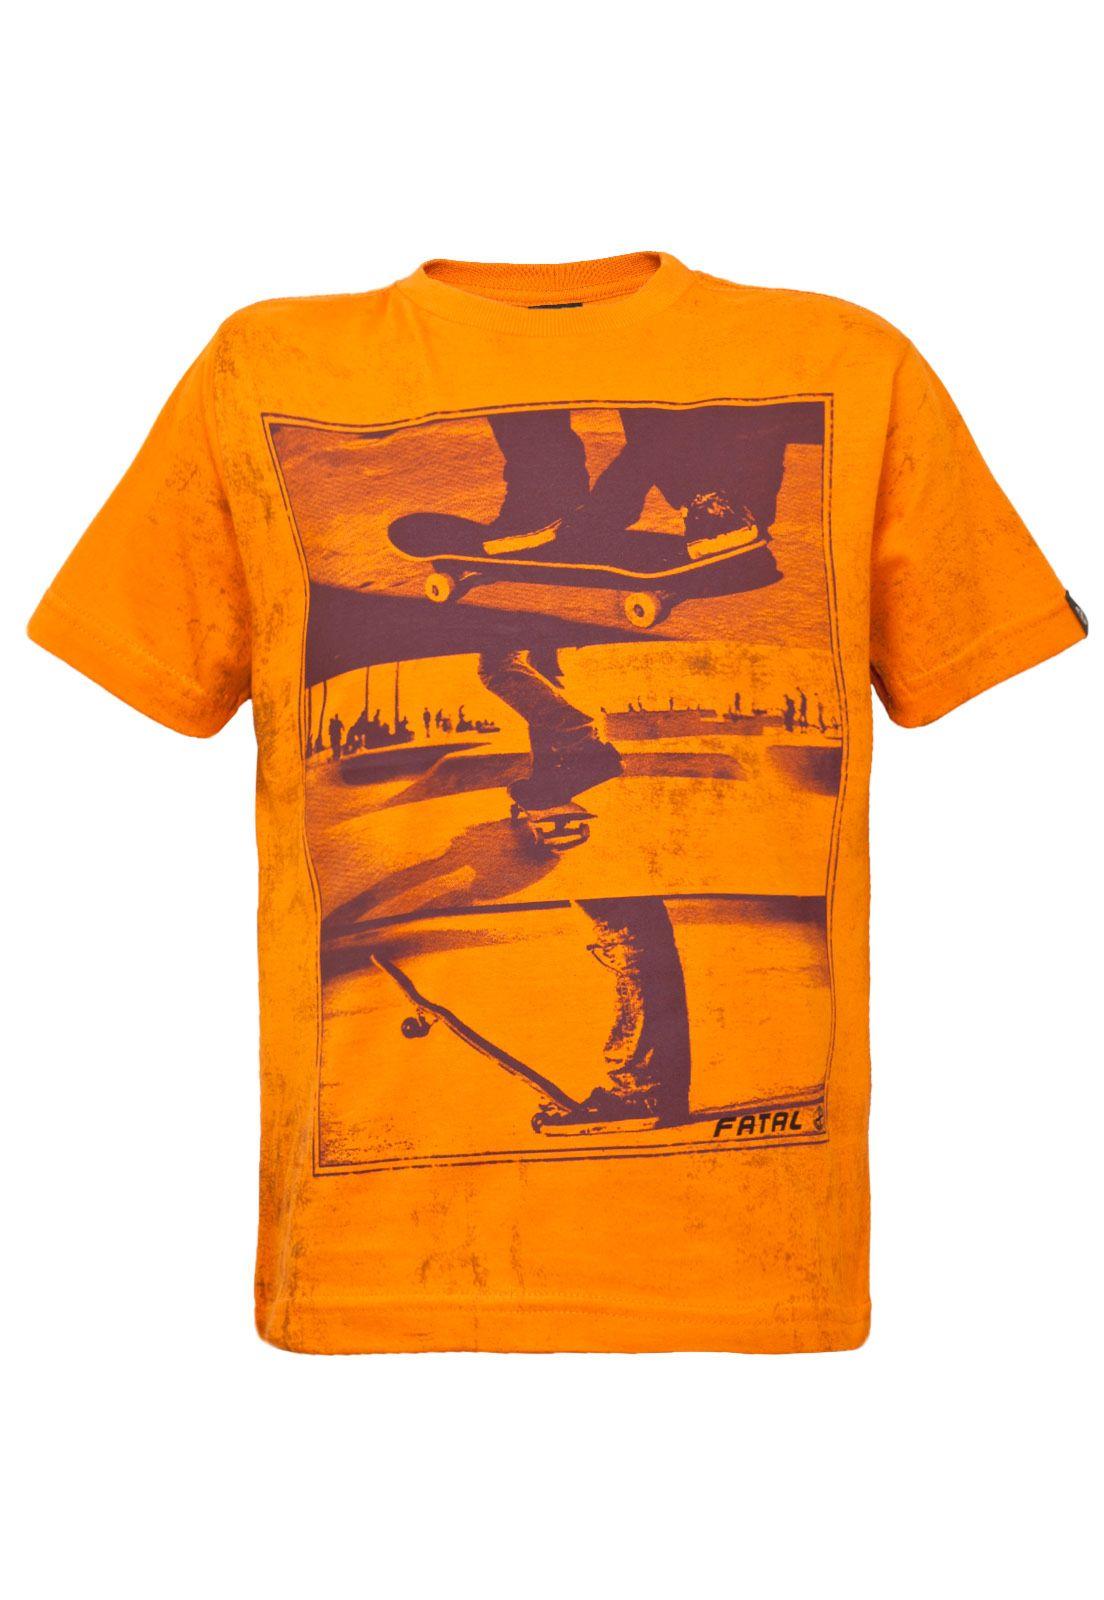 5f75cb4be Camiseta Infantil Fatal Skate Laranja - Compre Agora | Dafiti Brasil